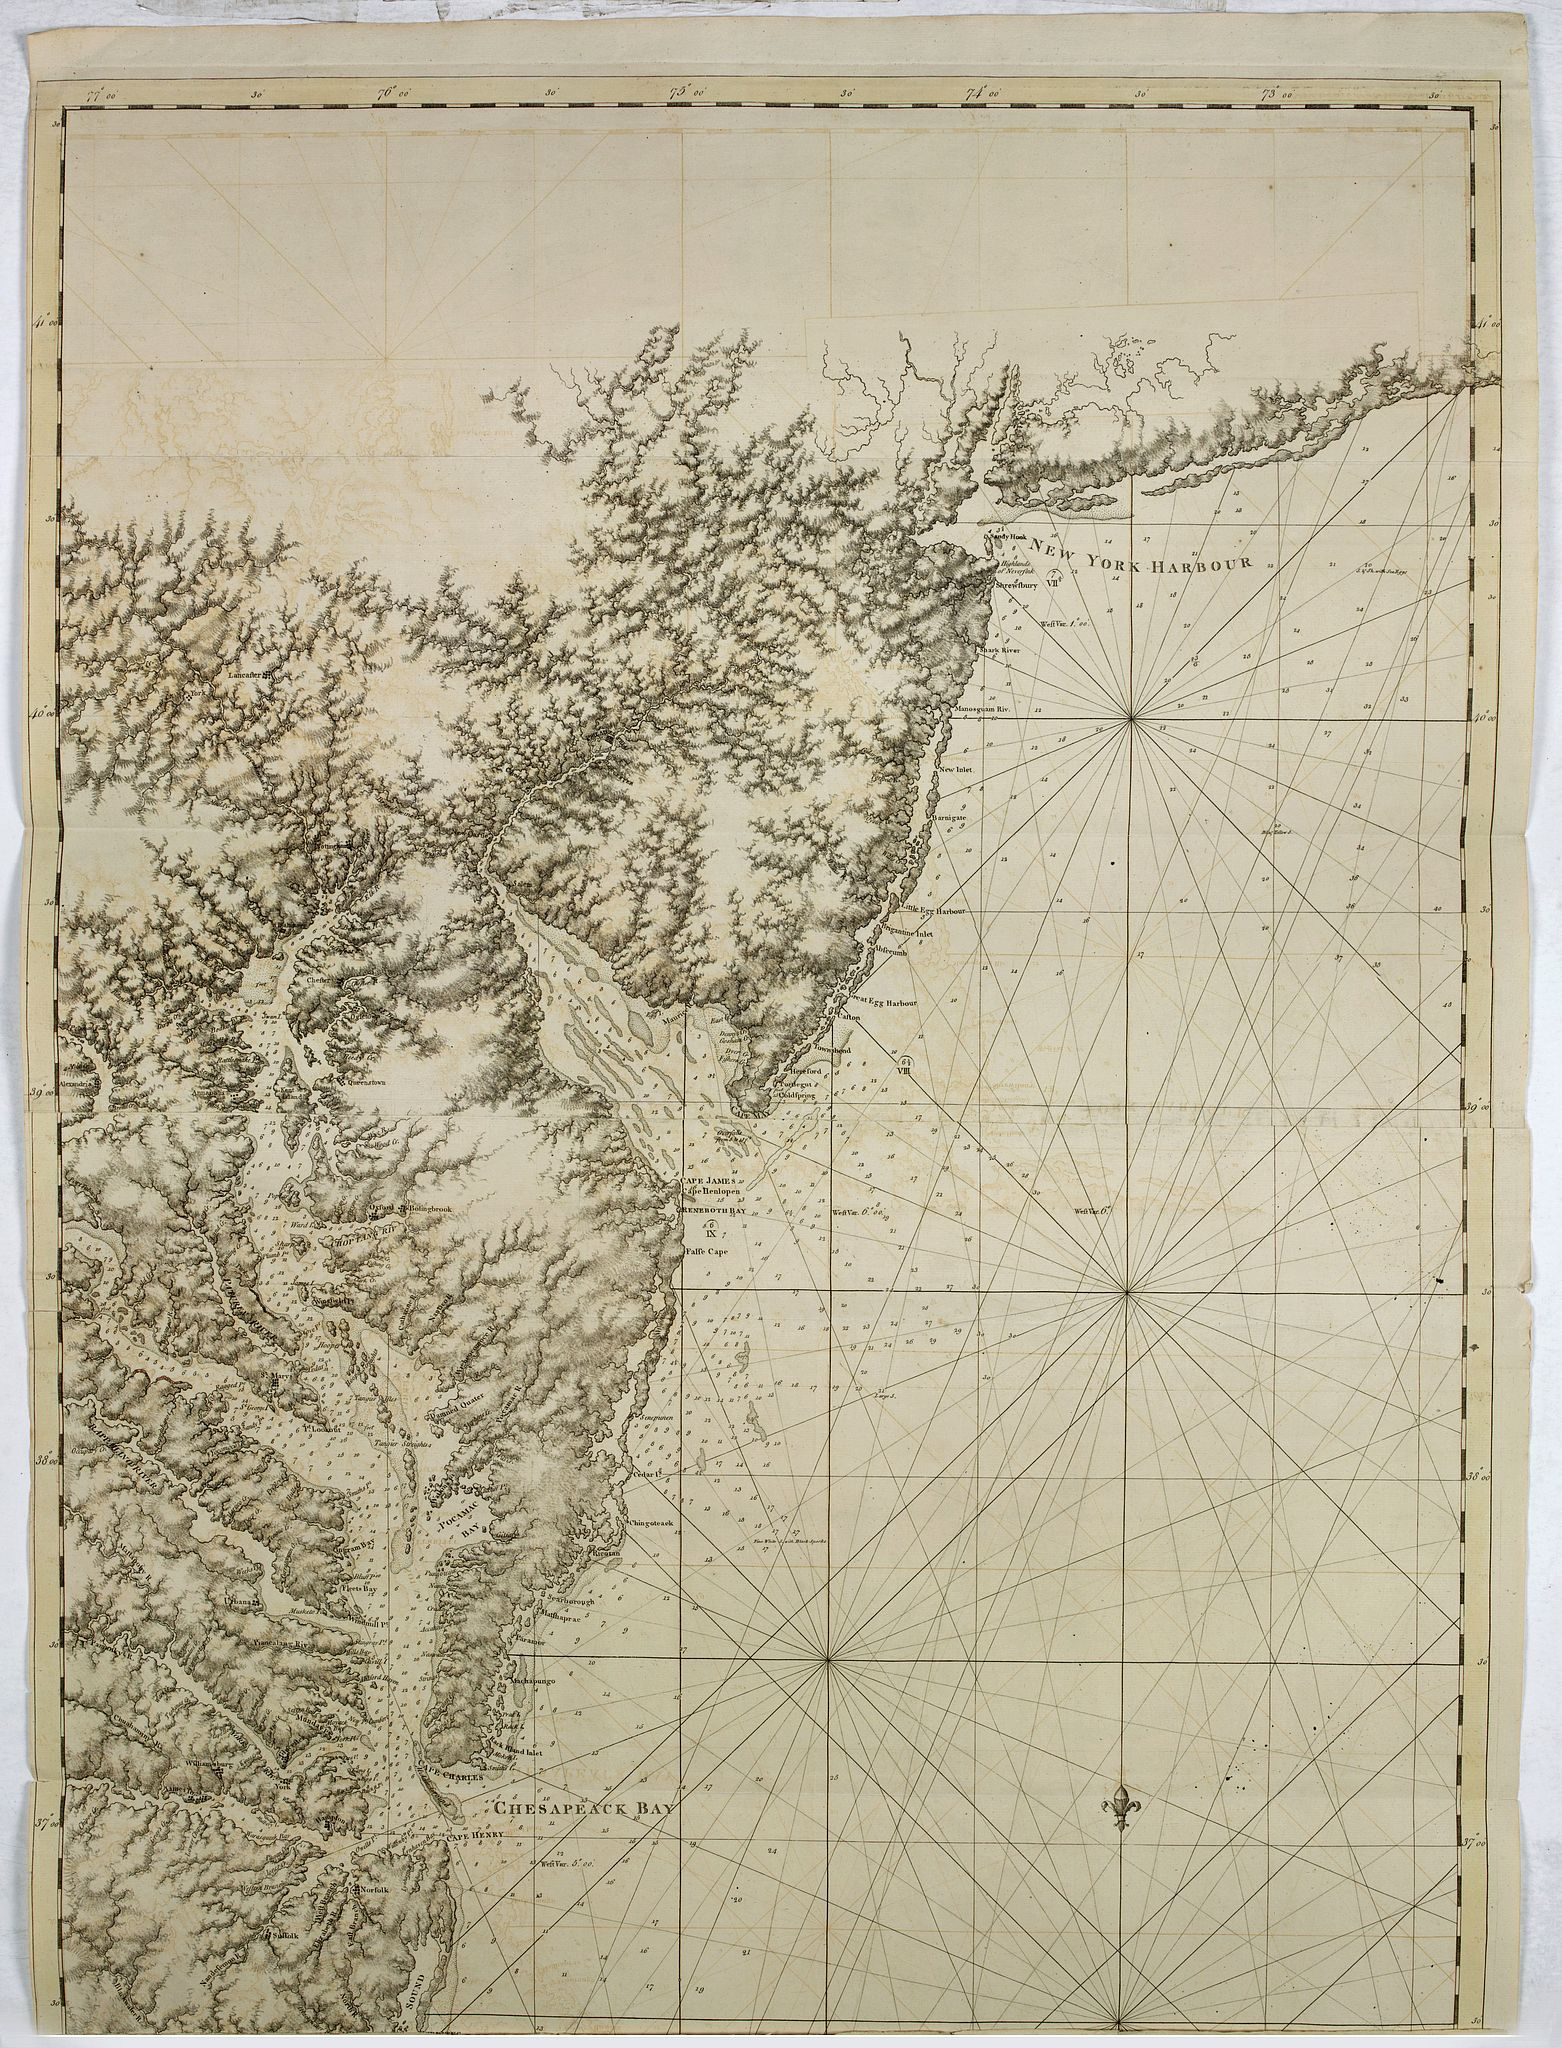 DES BARRES, J.F.W. -  A chart of the coast of New York, New Jersey, Pensilvania, Maryland, Virginia, North Carolina, & c. . . .